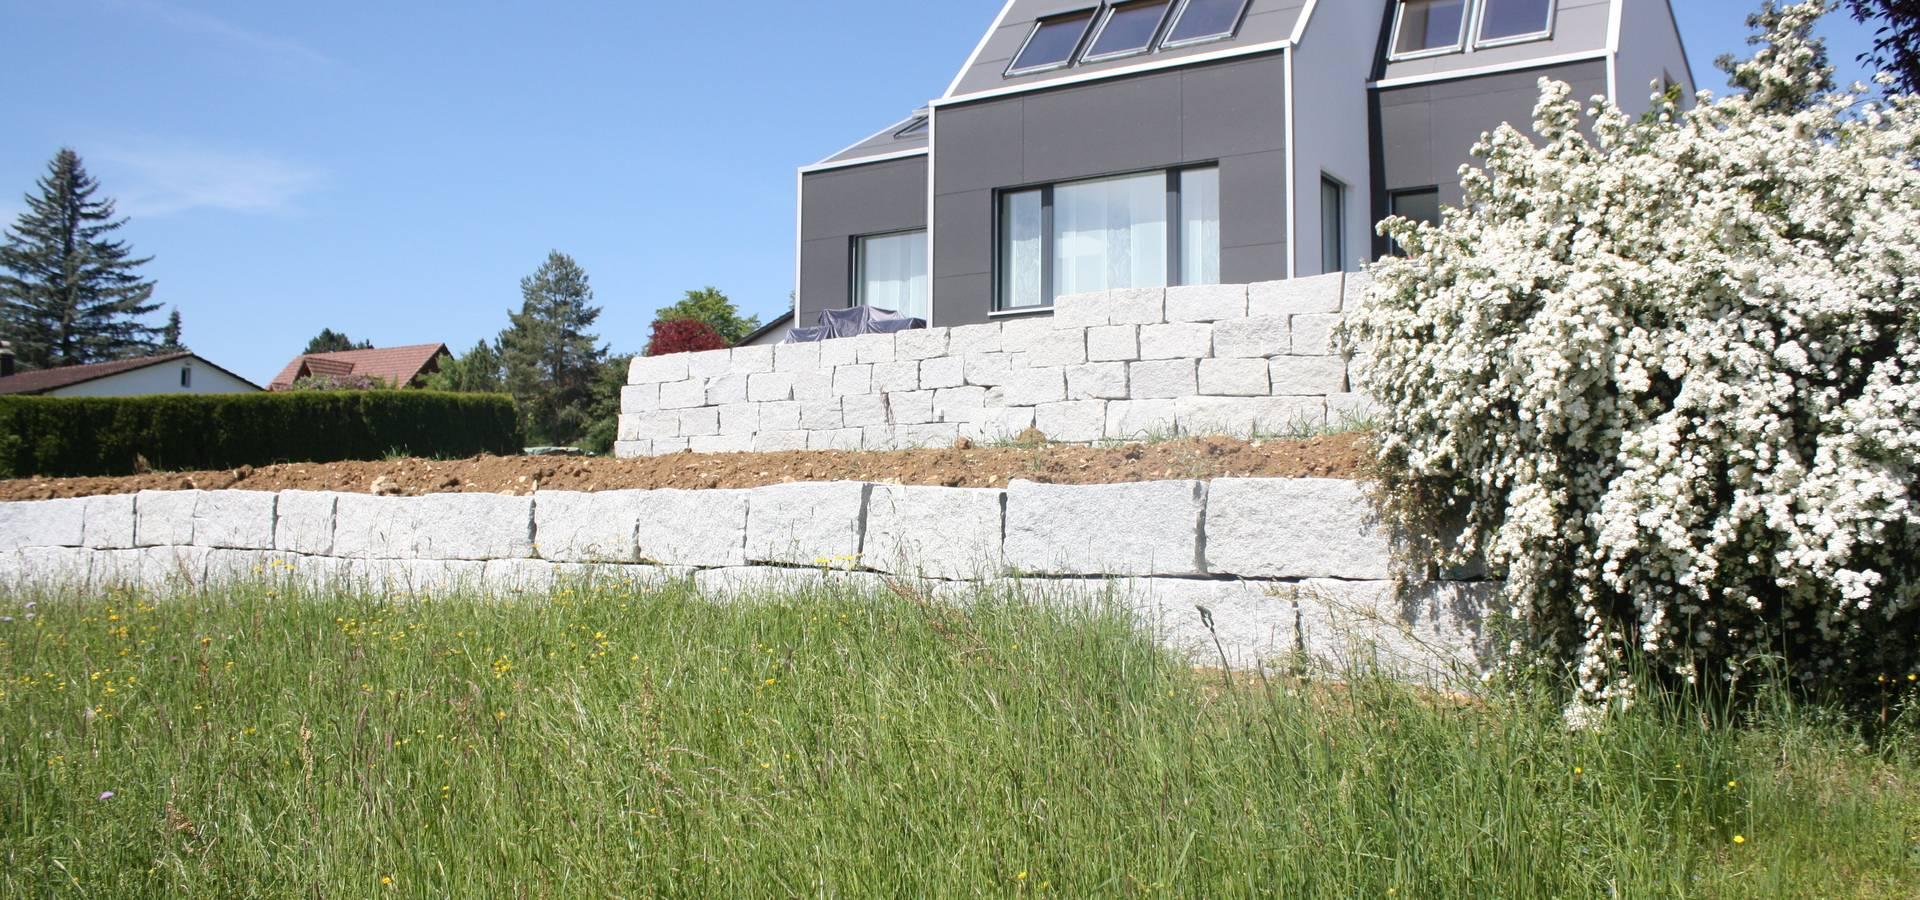 wohlgemuth & pafumi | architekten ag